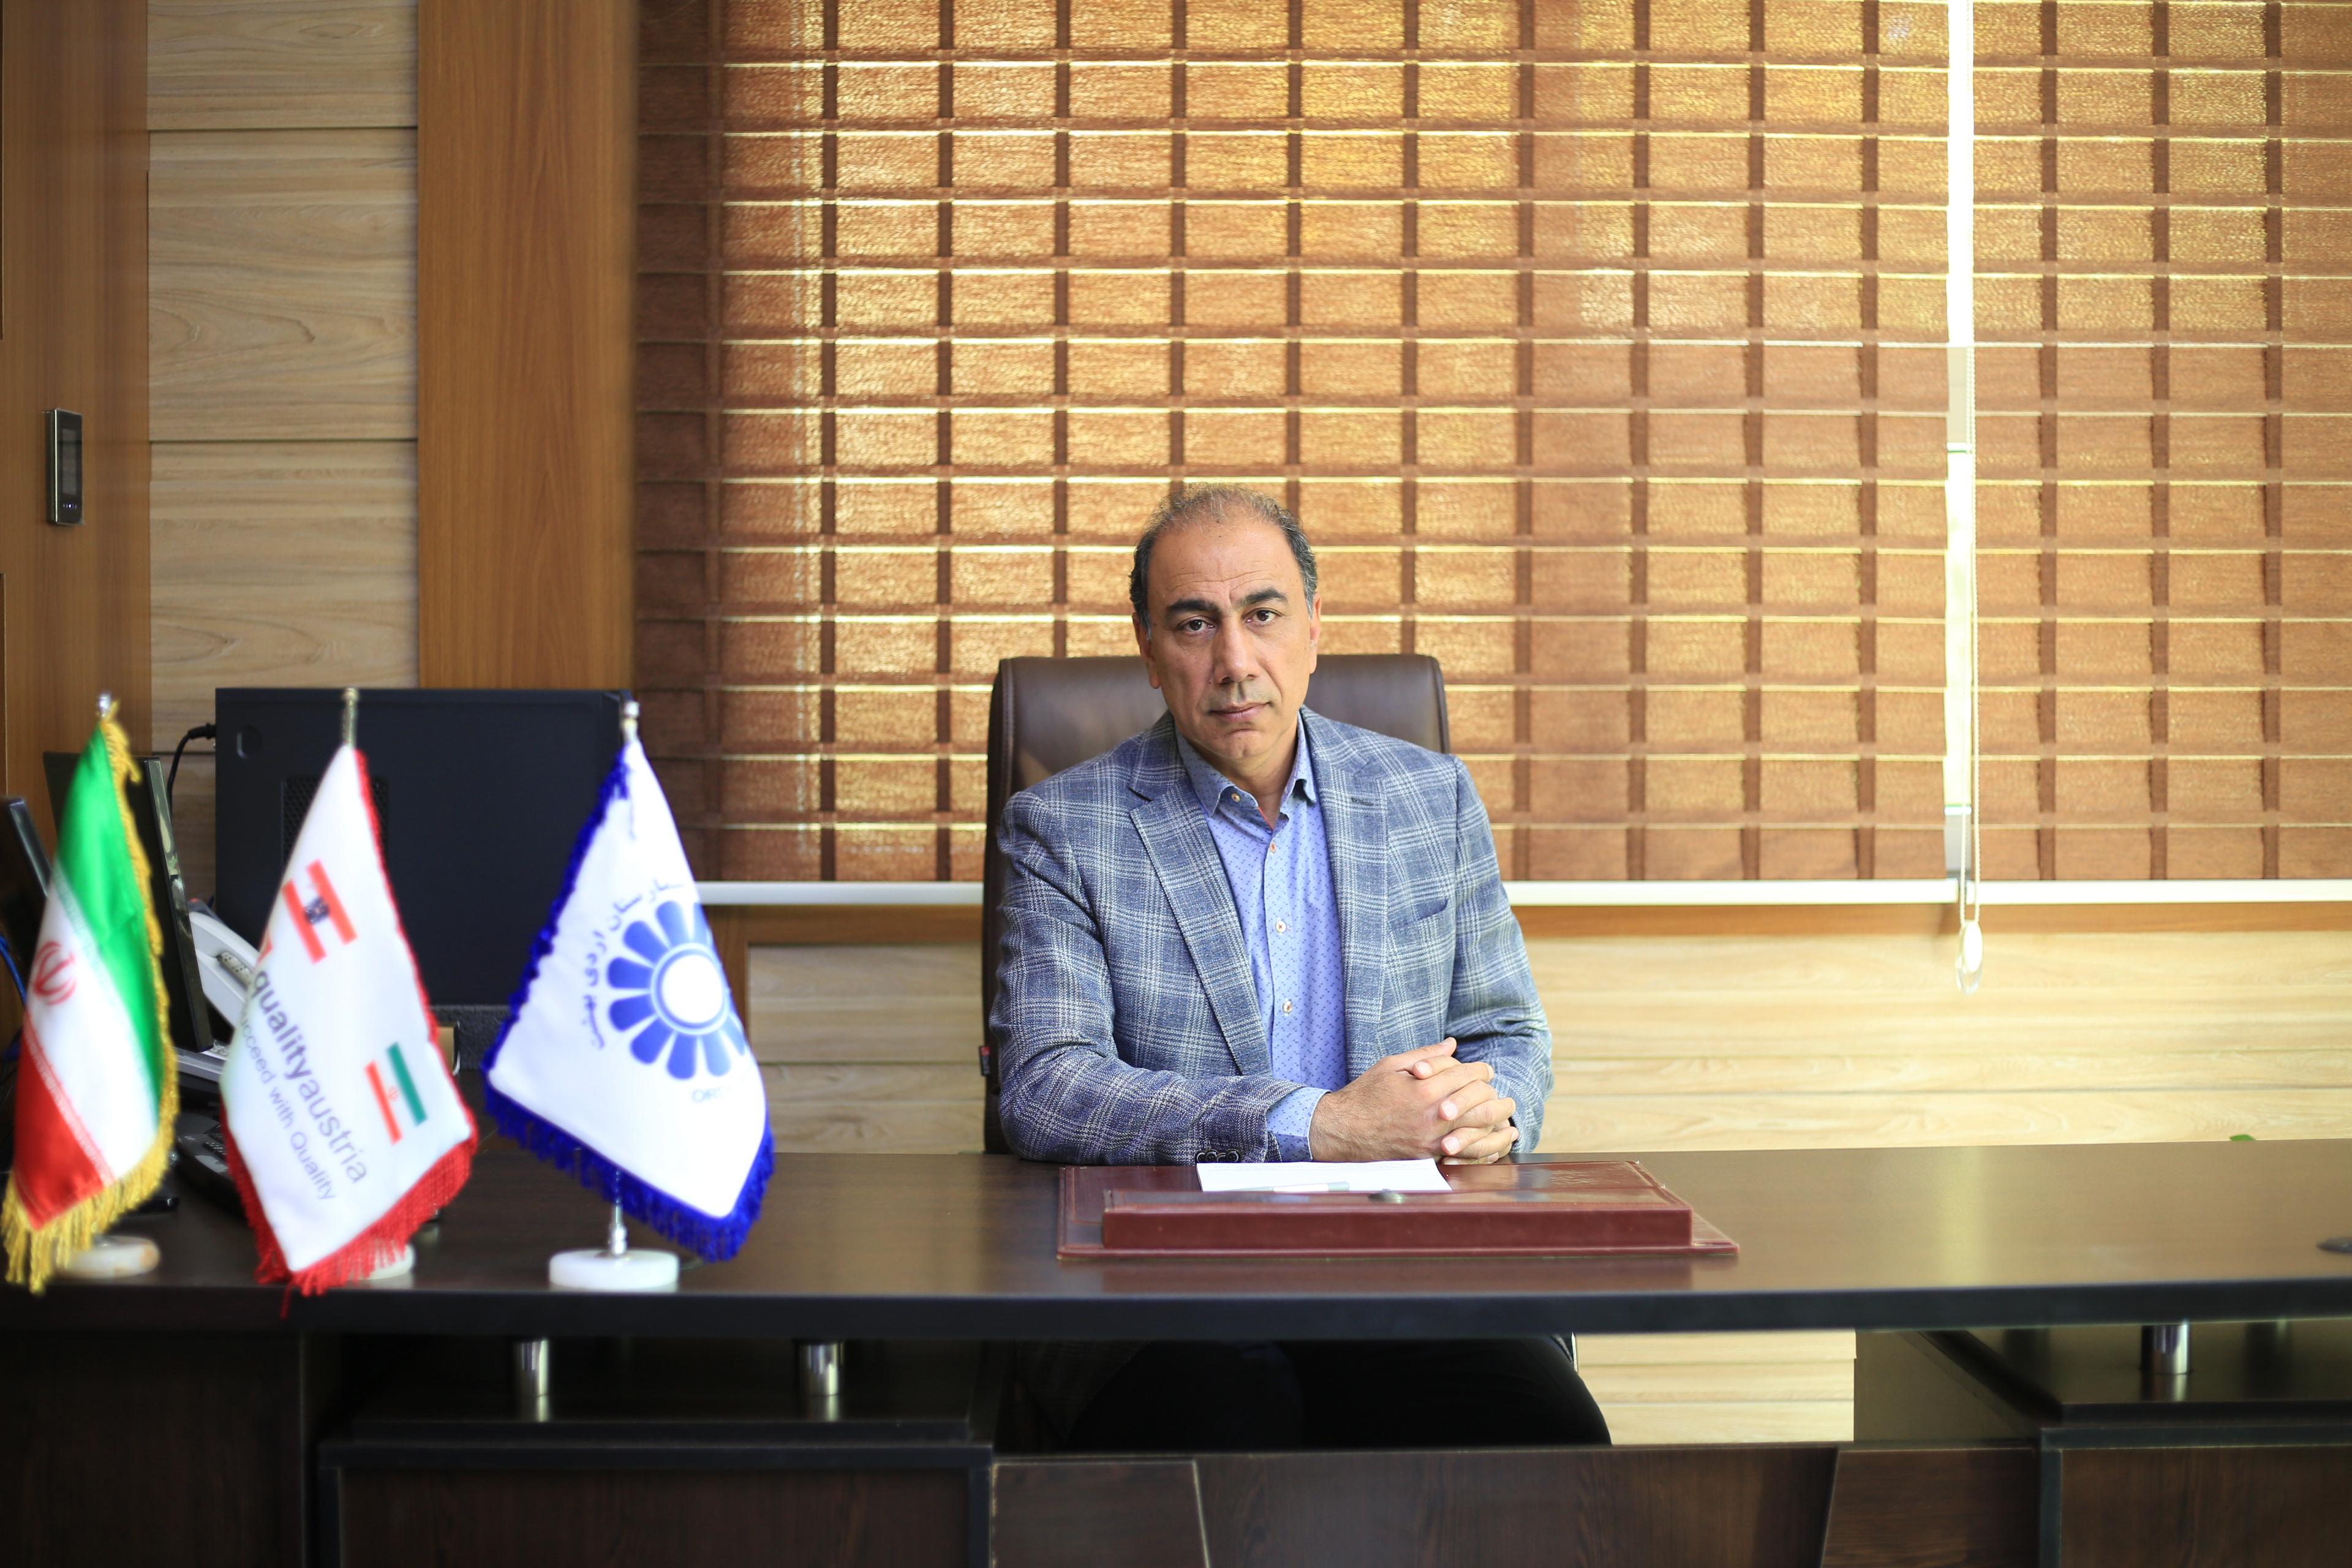 Dr. Seyyed Kazem Feisty-managing director message of Ordibehesht Hospital